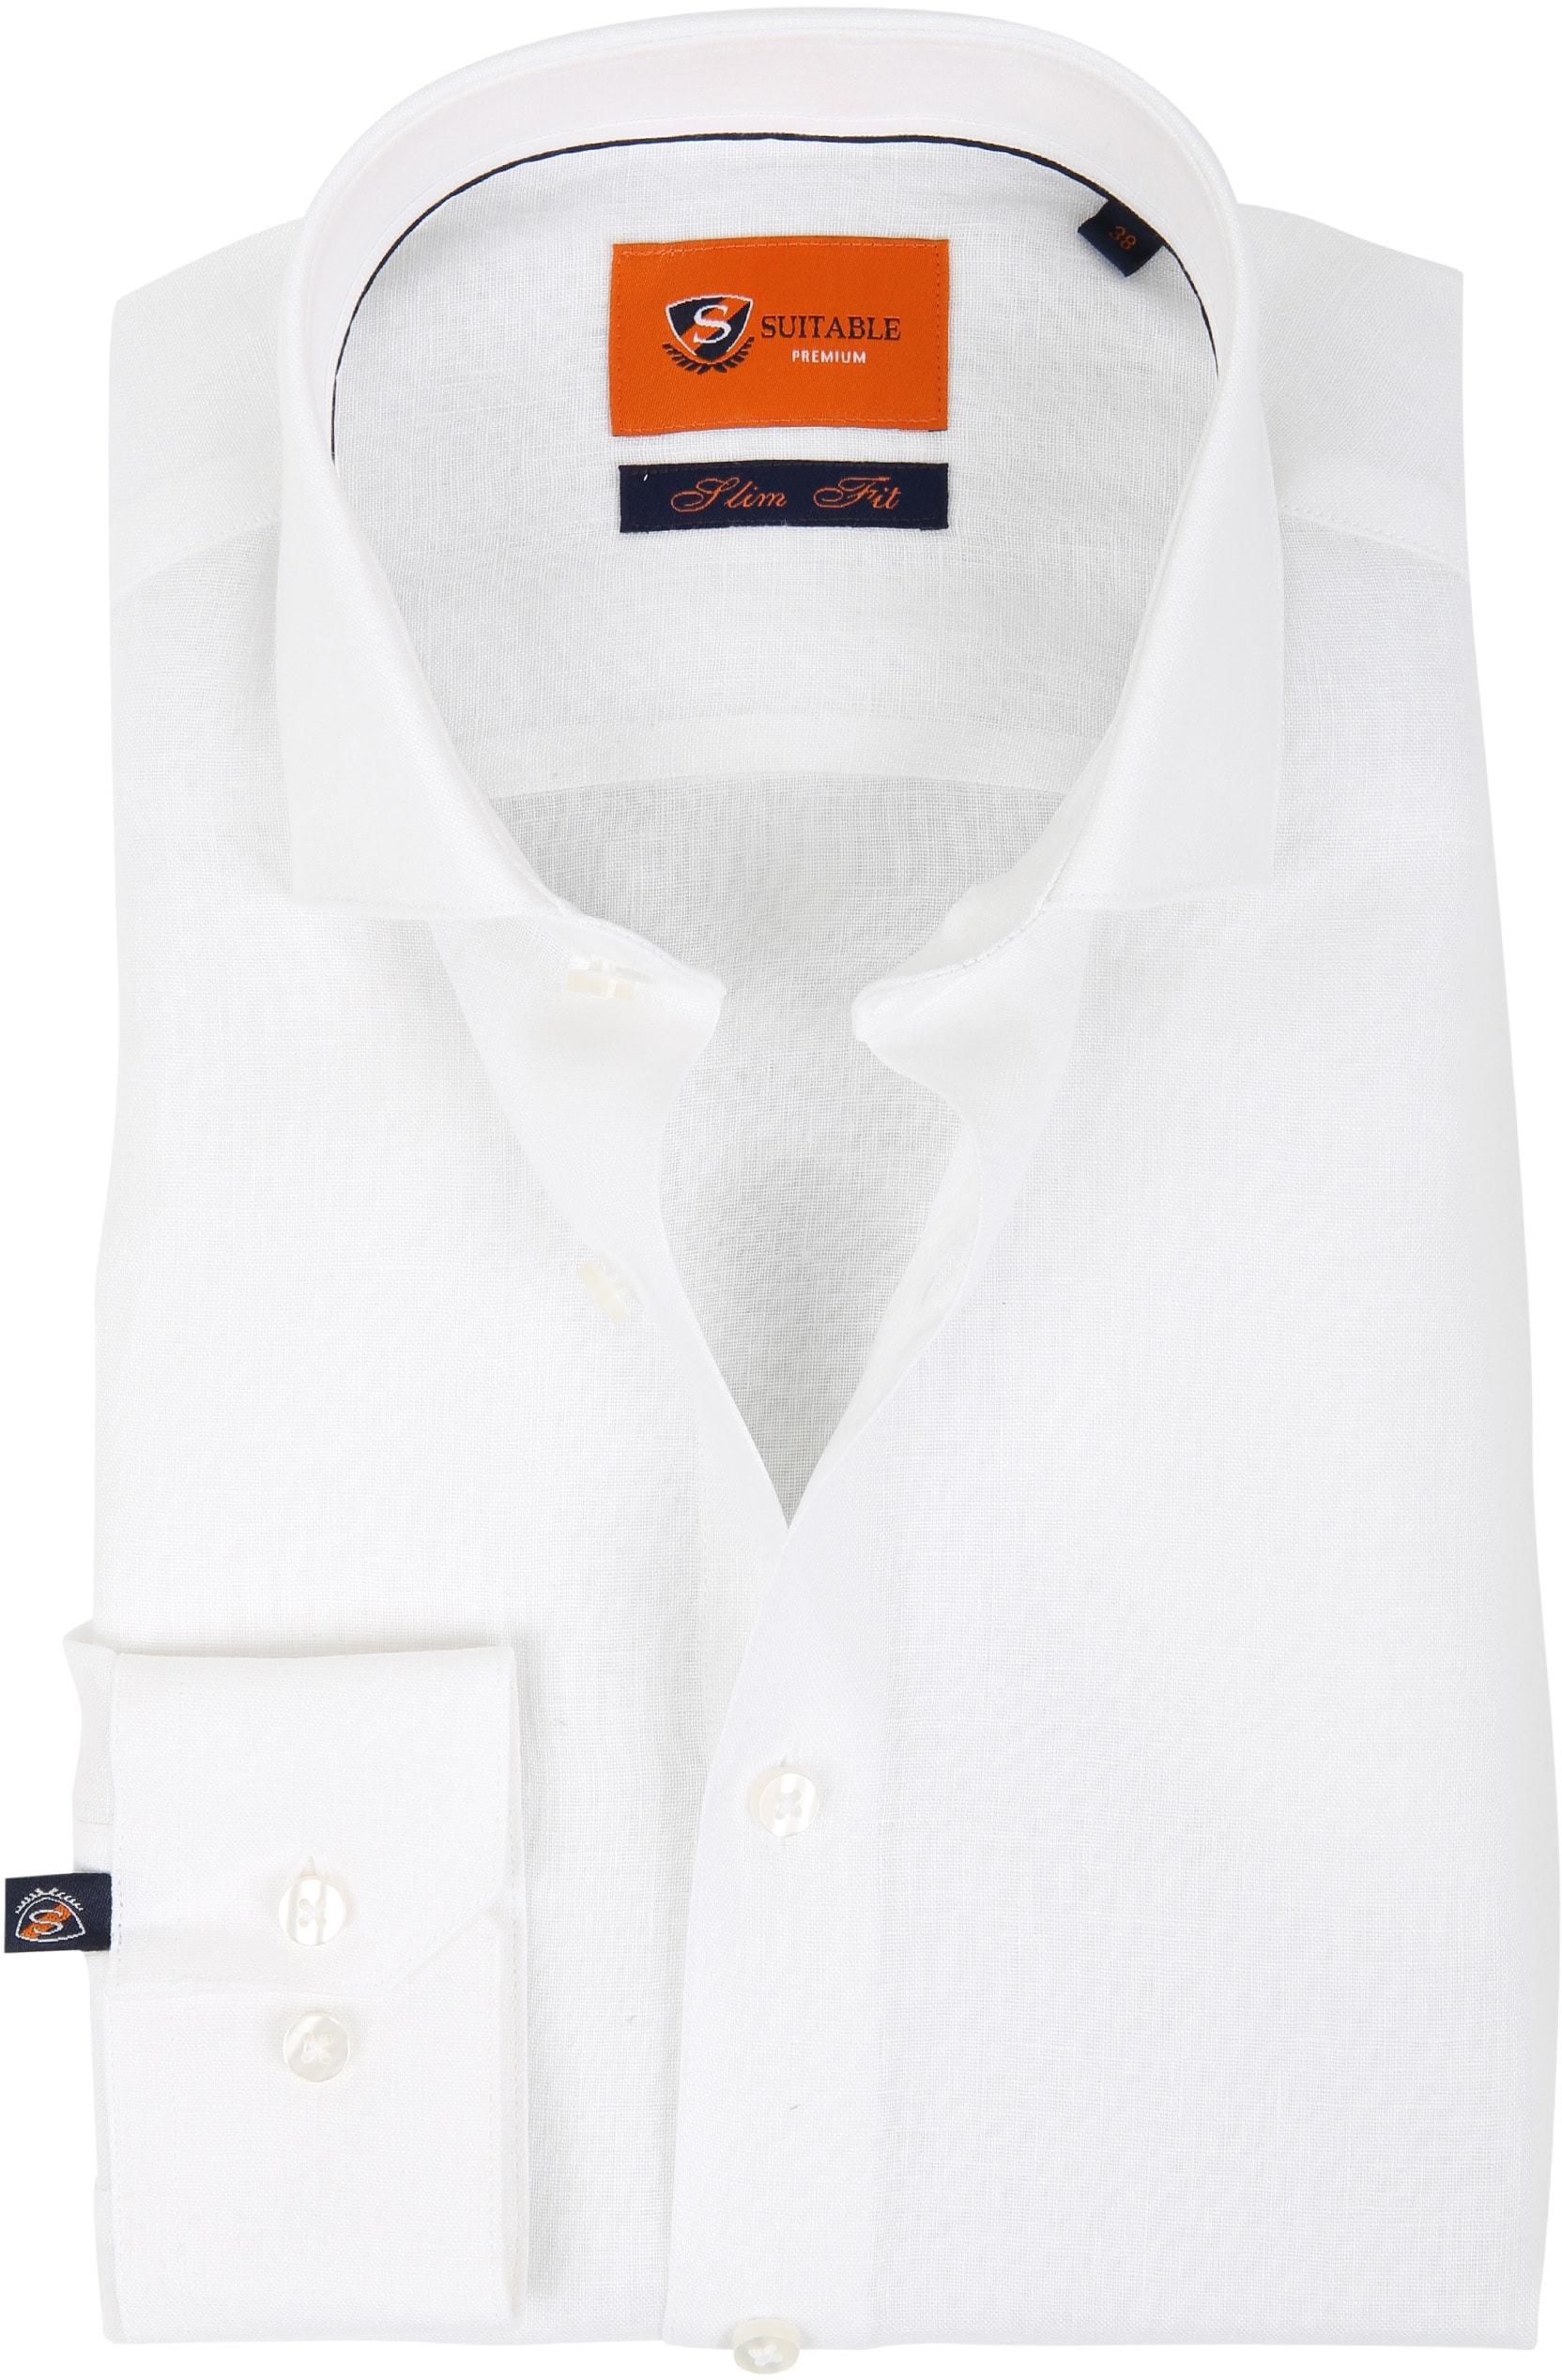 Suitable Overhemd Linnen Wit D81-13 foto 0